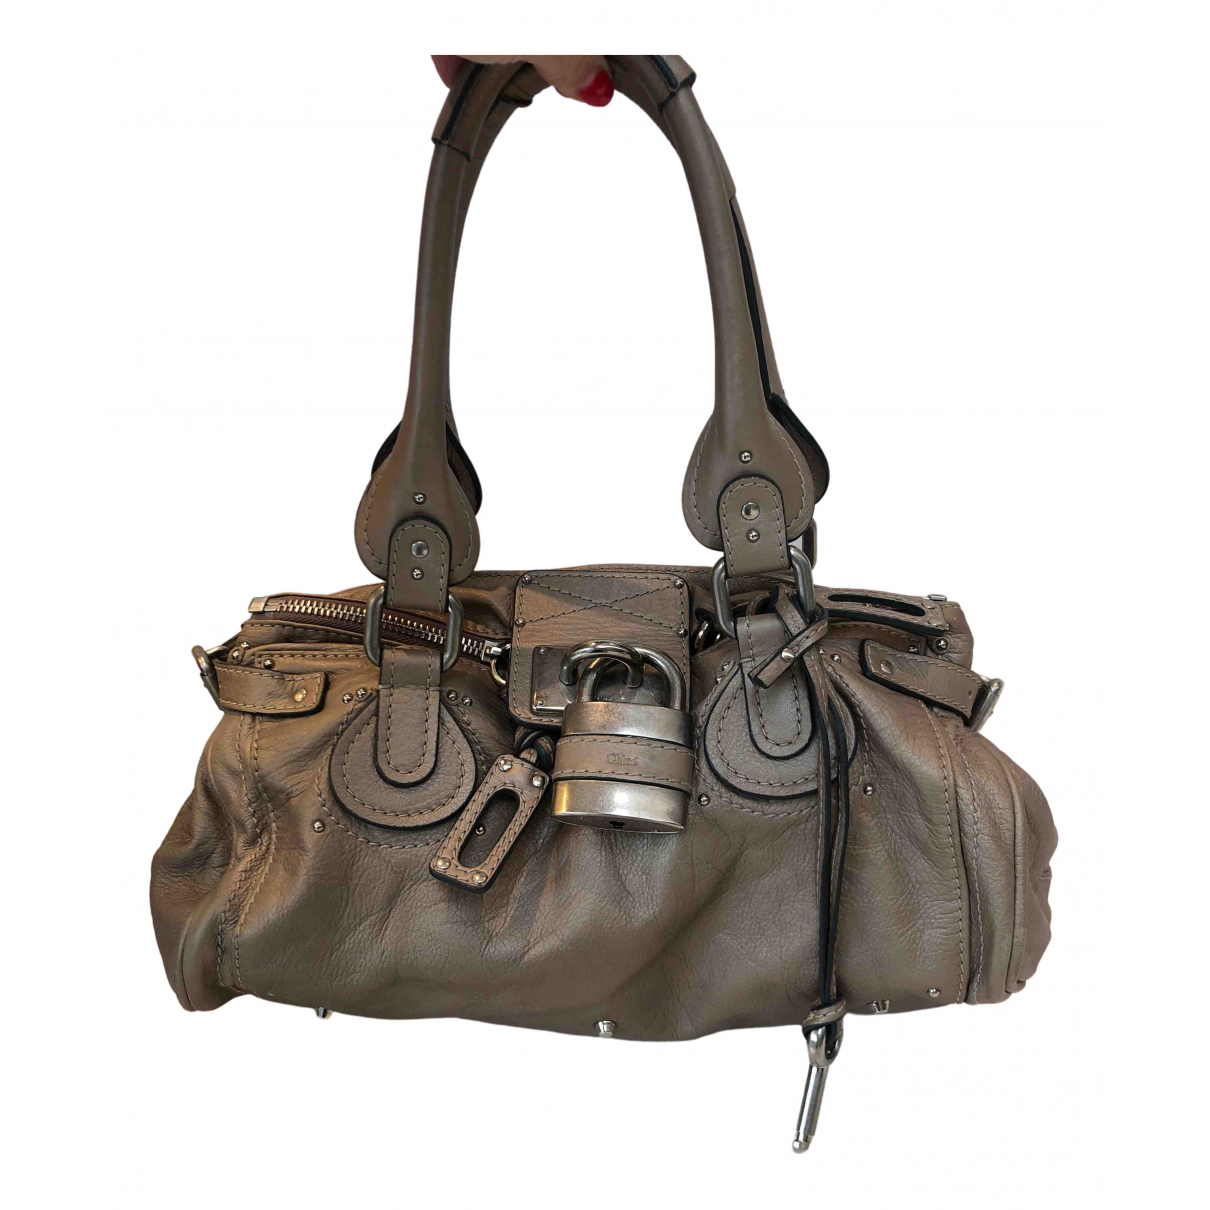 Chloé Paddington Metallic Leather handbag for Women N